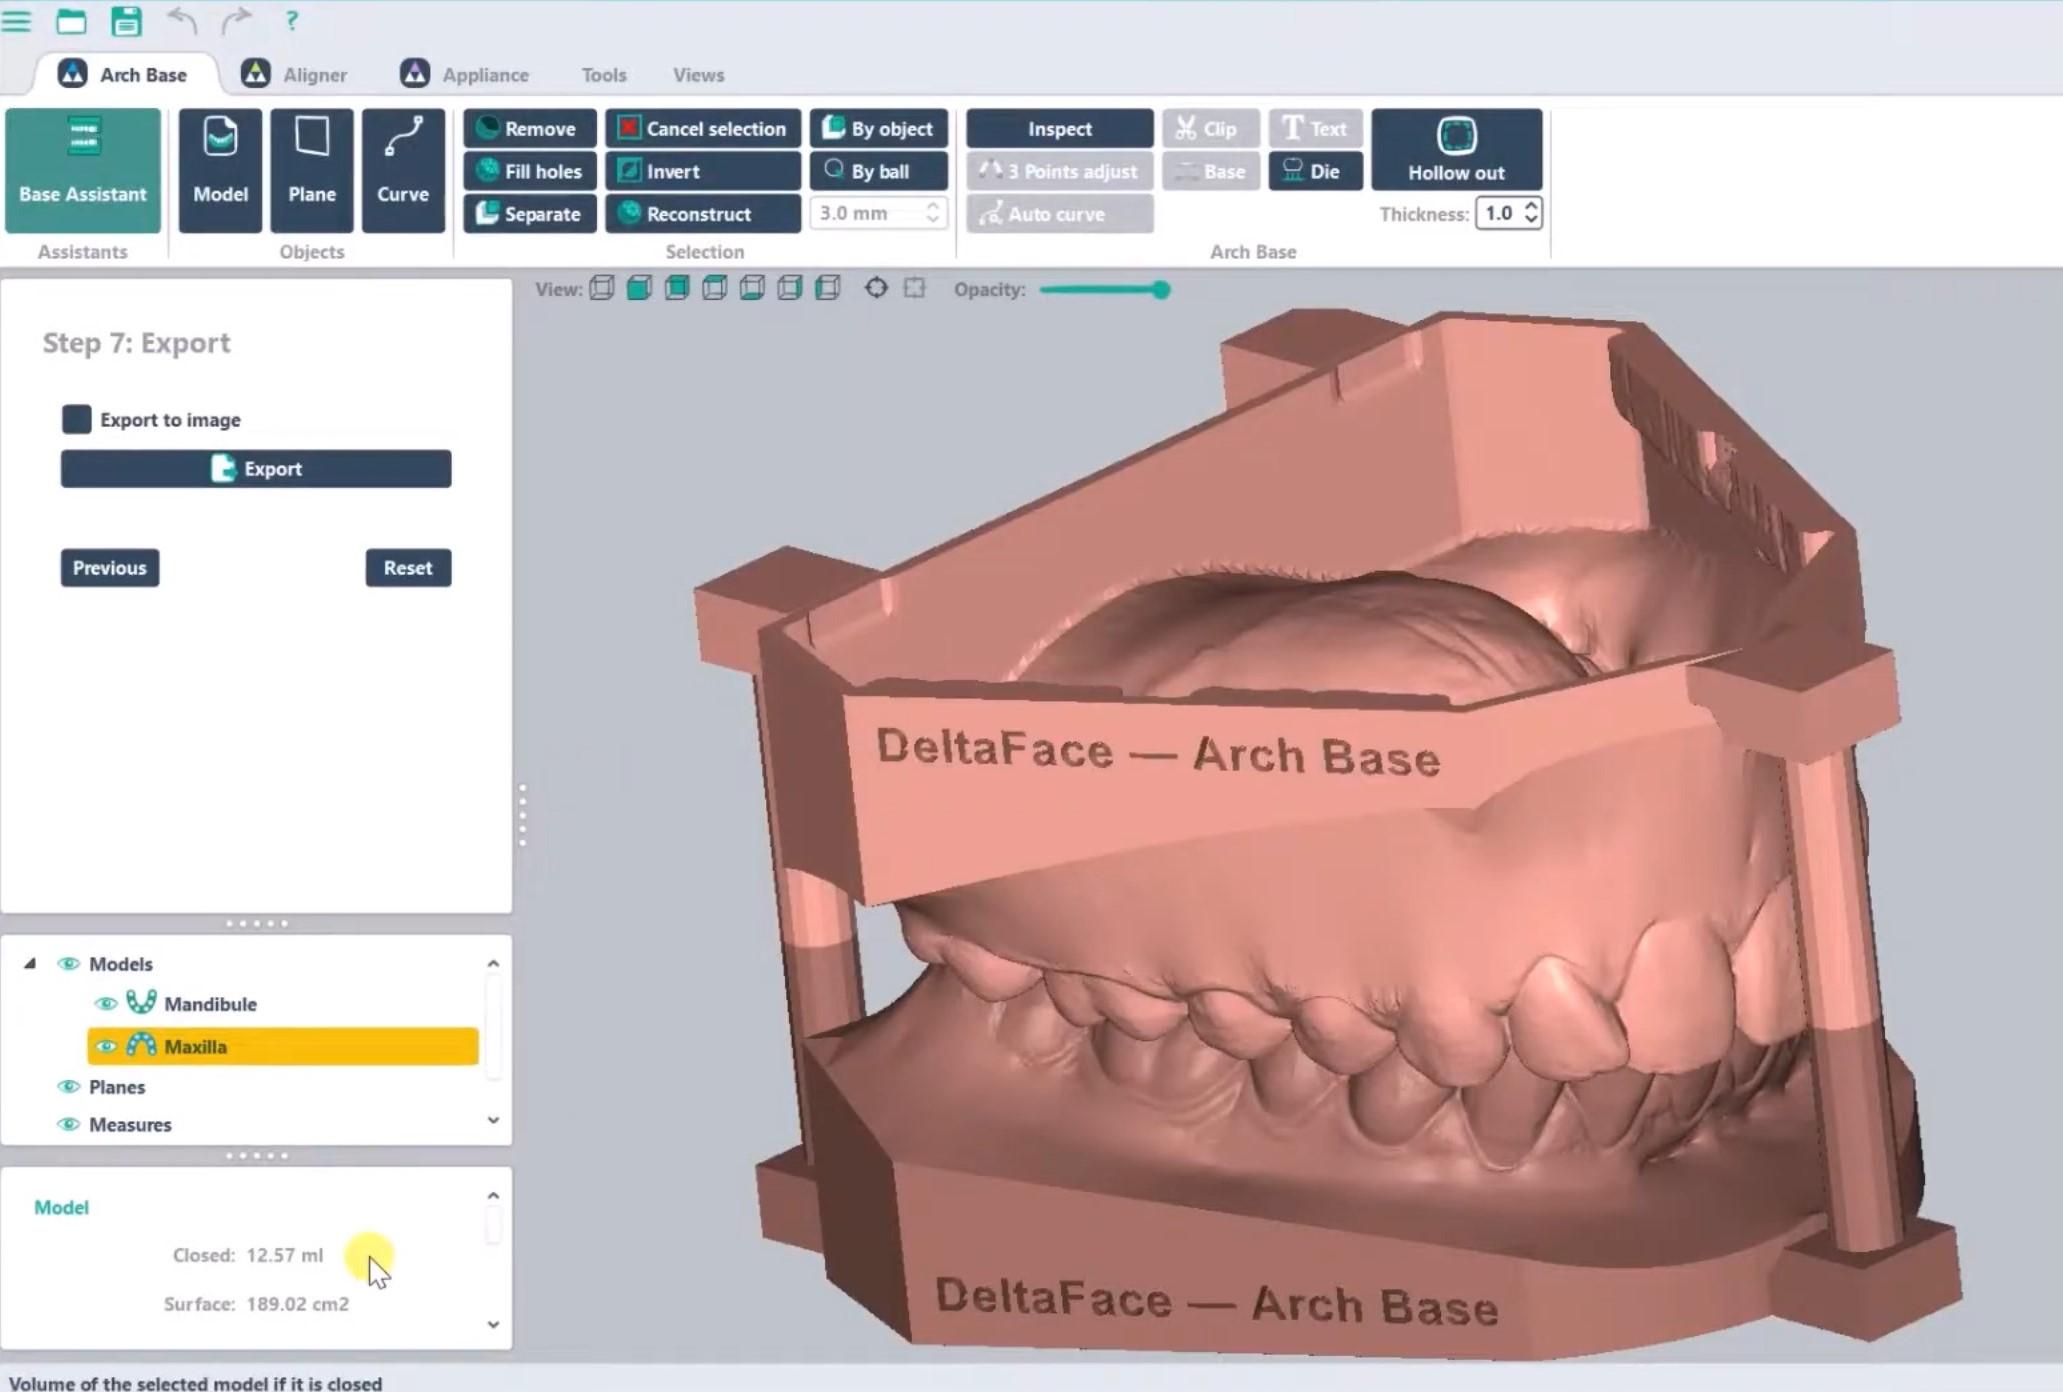 Hollow out 3D dental model Arch Base Deltaface